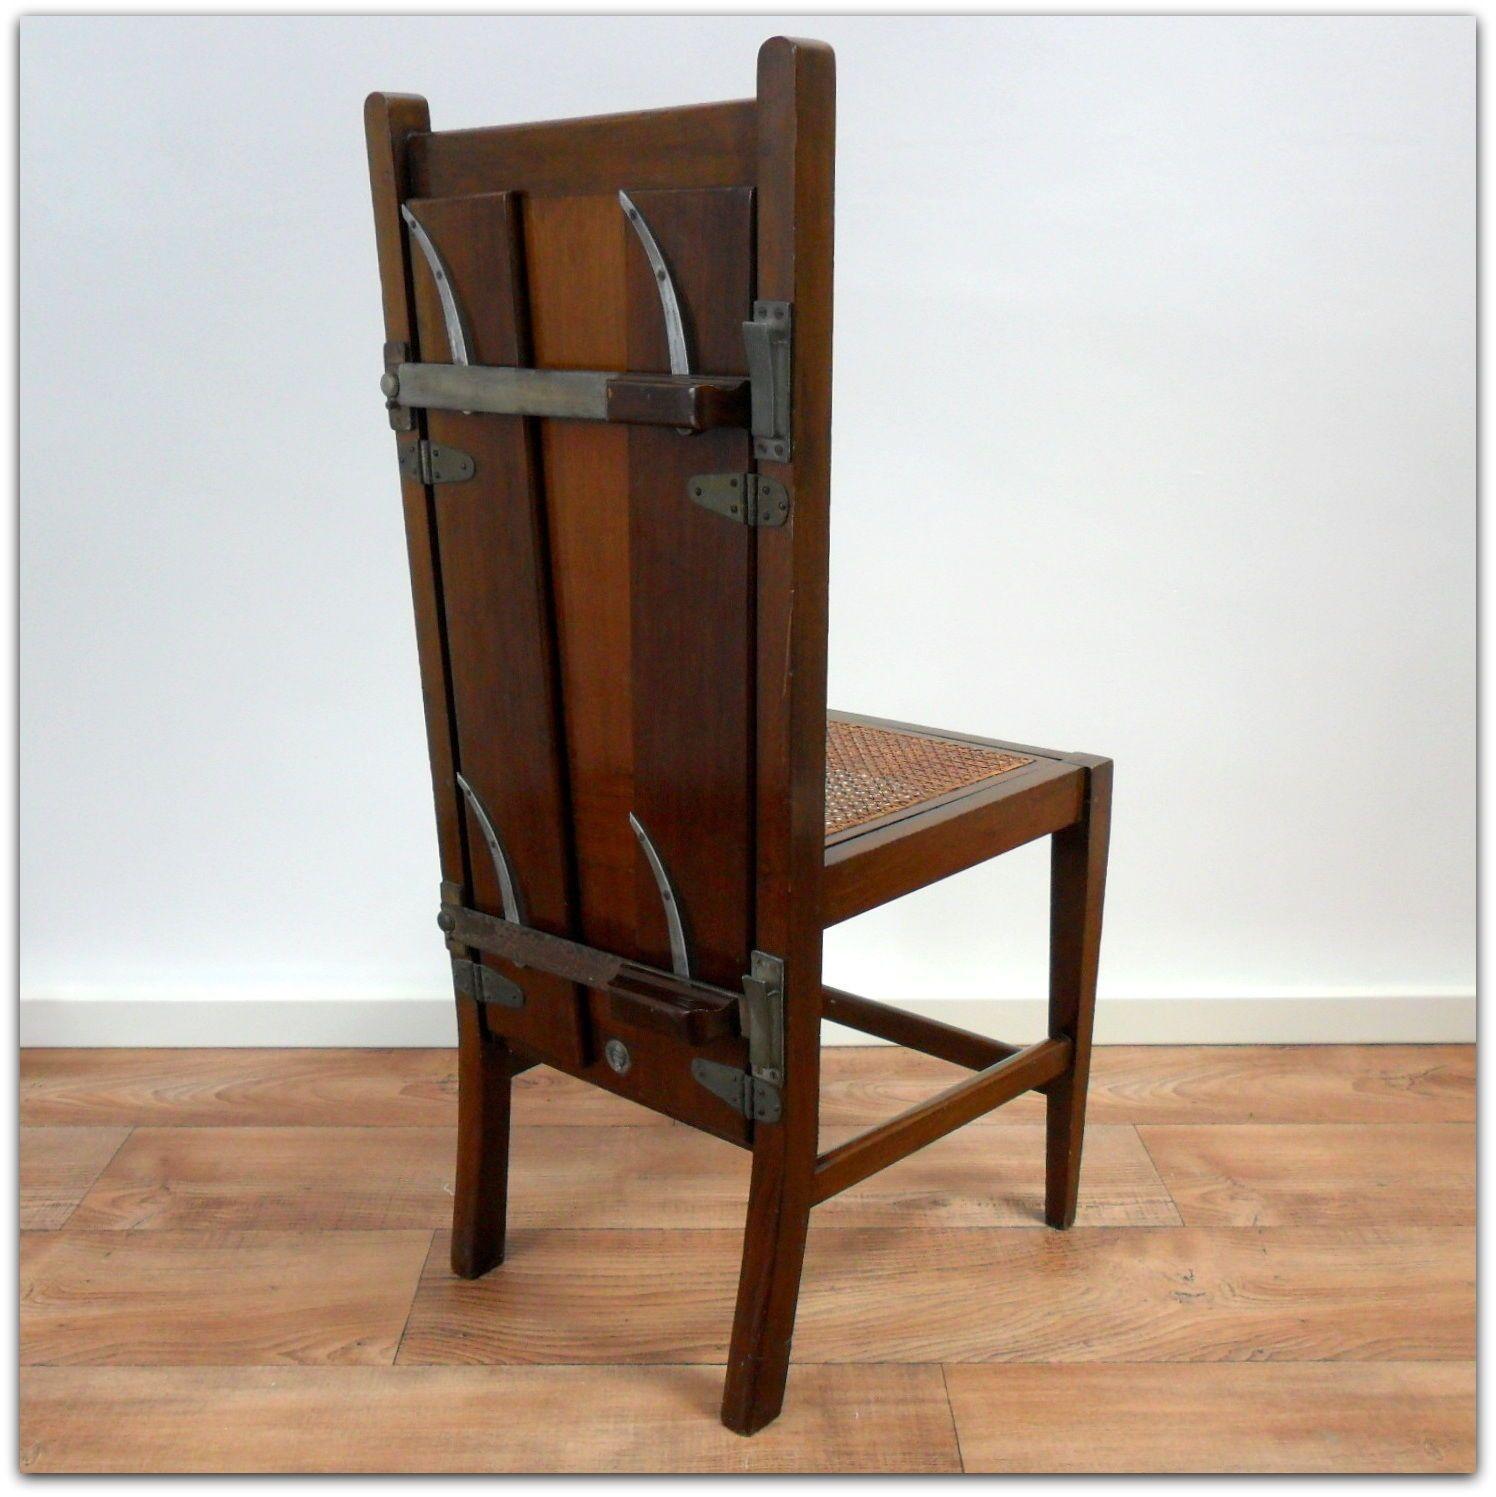 bedroom chair on ebay coyote hunting 1900 39s handsome antique edwardian oak gentleman trouser